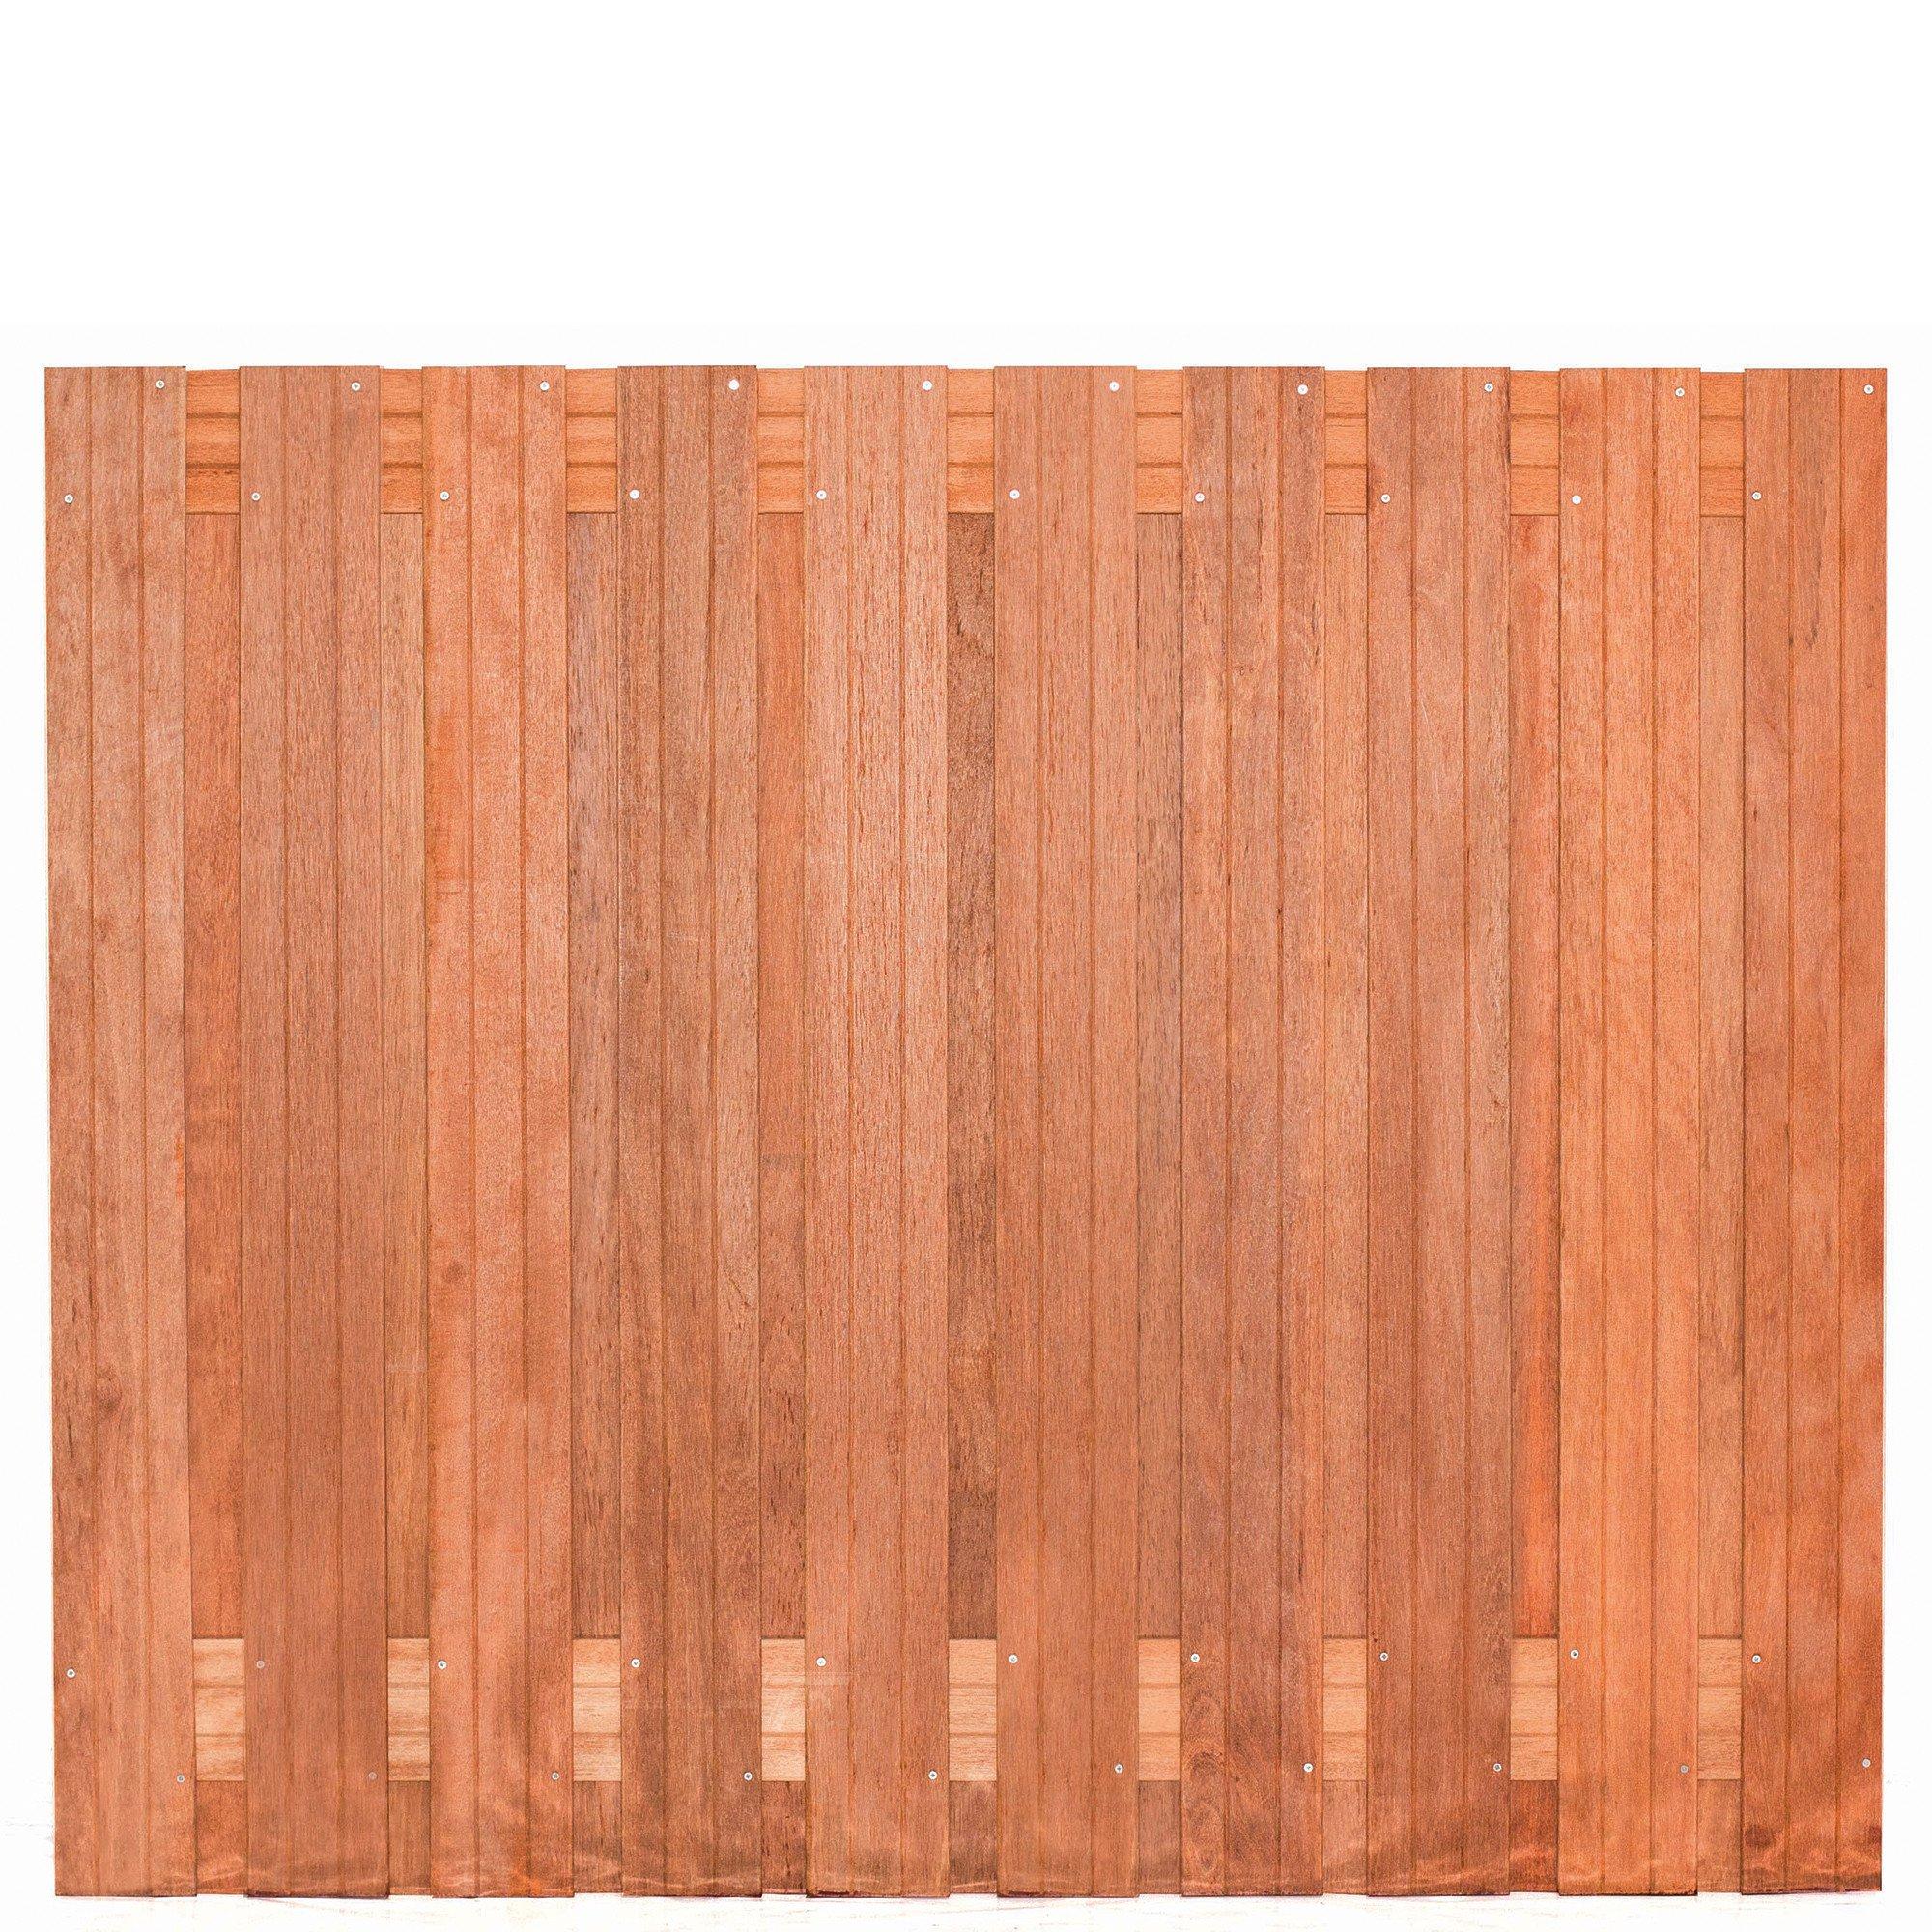 Hardhouten privacy schutting recht 150x 180 cm. Type: Dronten 150